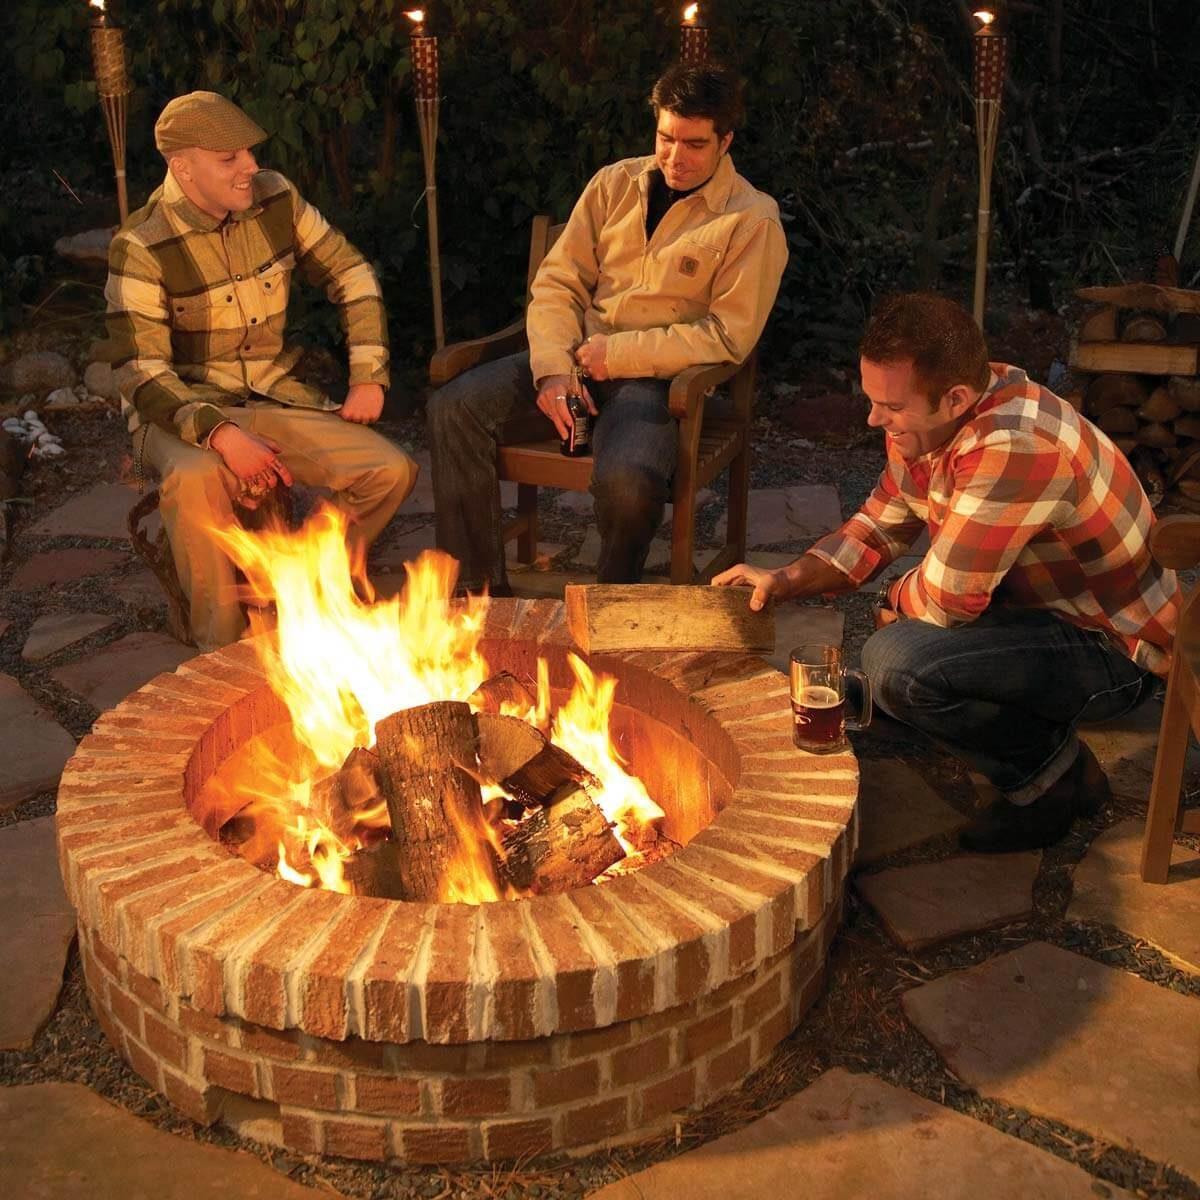 12 Great Backyard Fire Pit Ideas | The Family Handyman on Fireplace In Yard id=50515